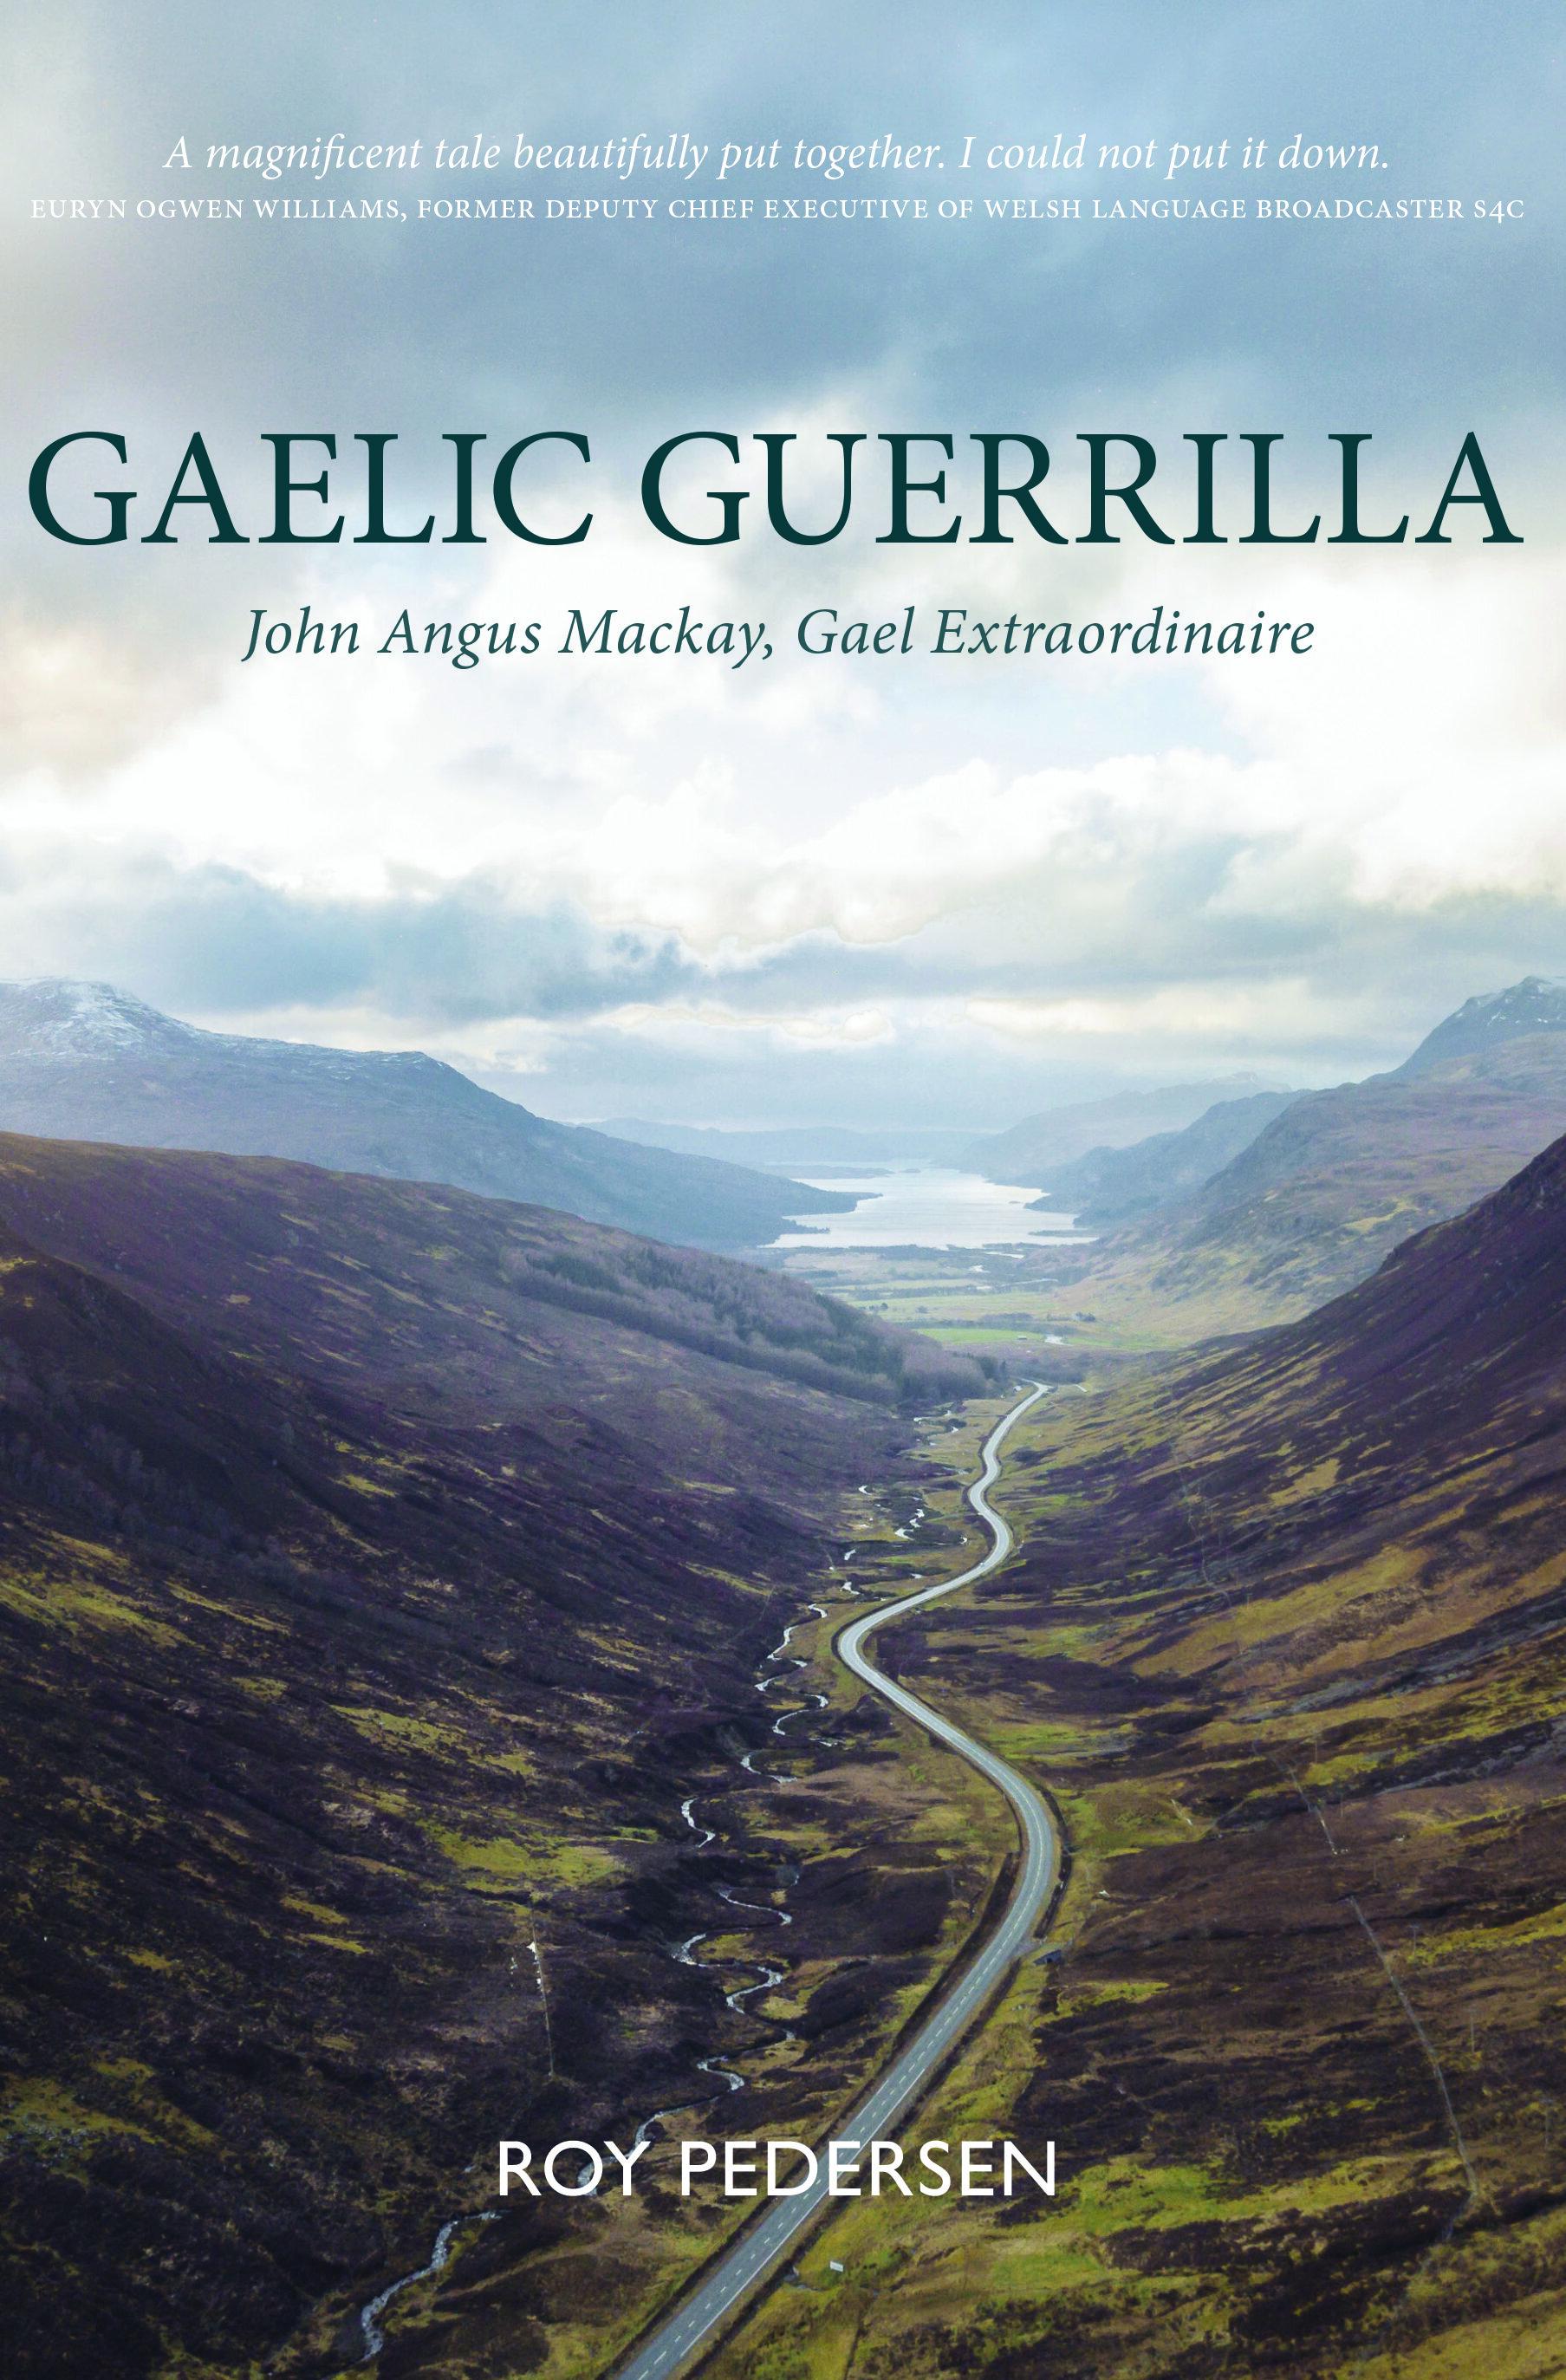 Gaelic Guerilla Roy Pedersen 9781913025397 Luath Press.jpg